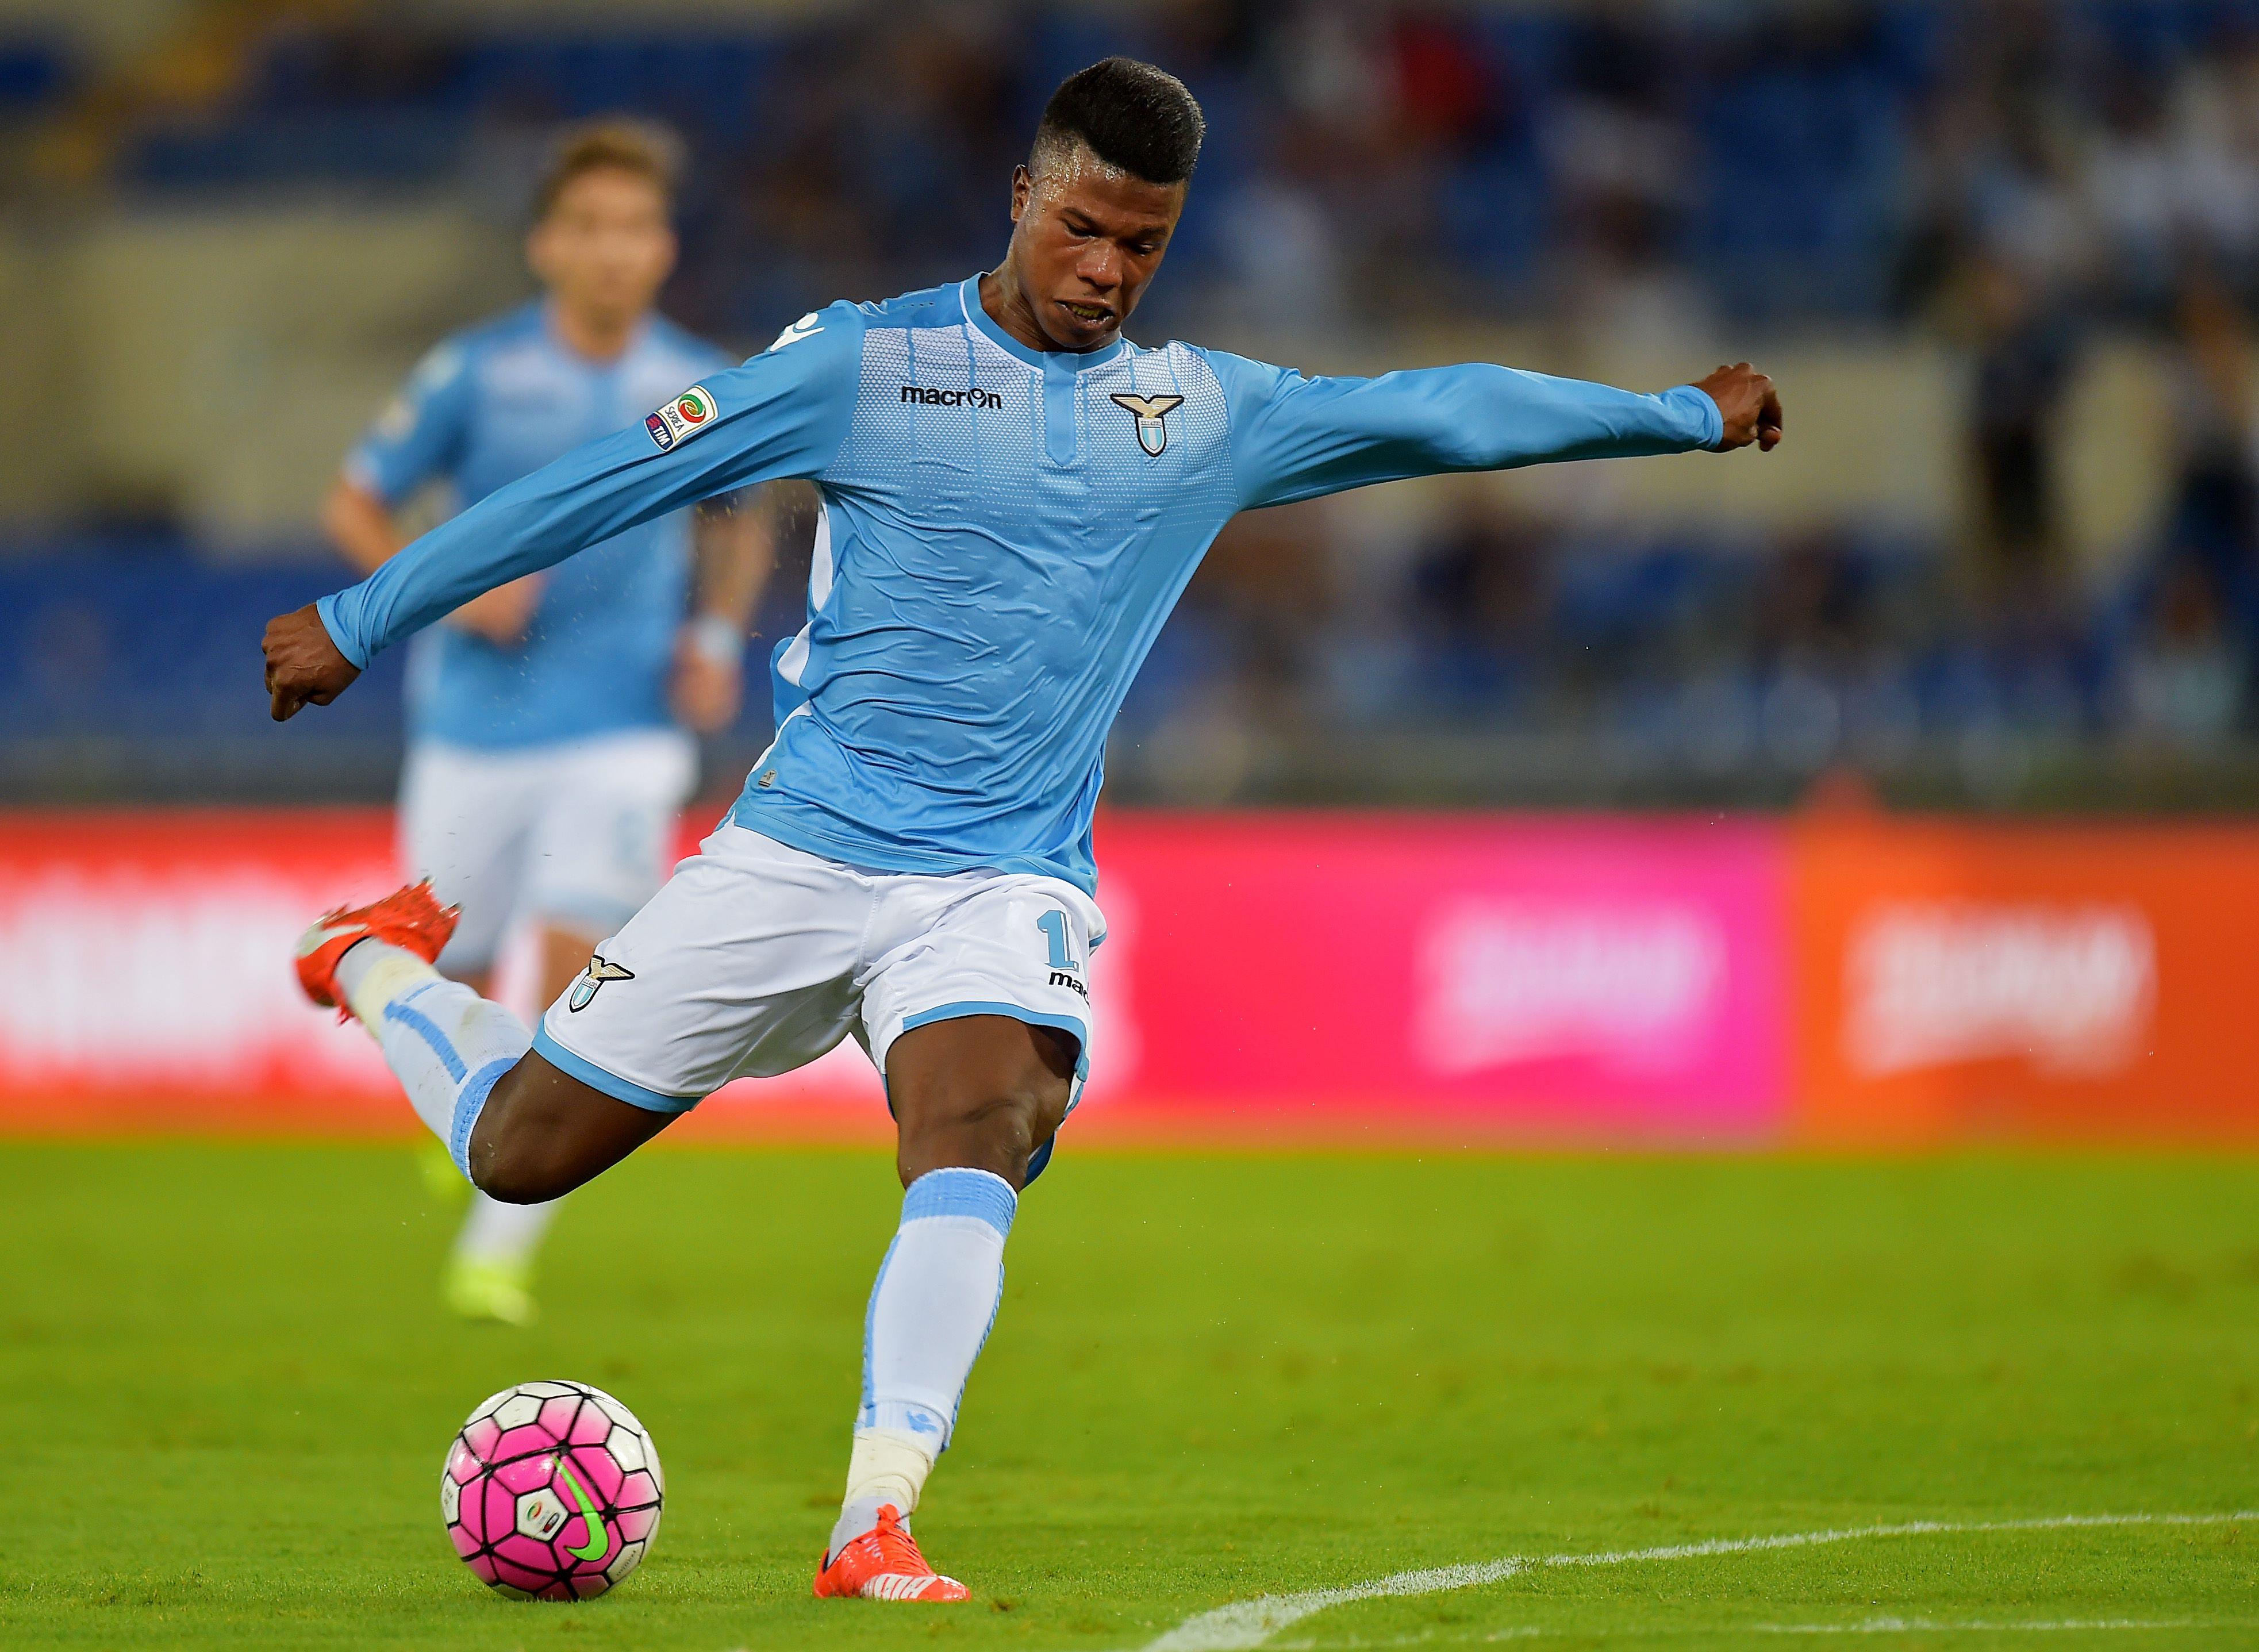 Lazio-v-Bologna-Keita-shoots